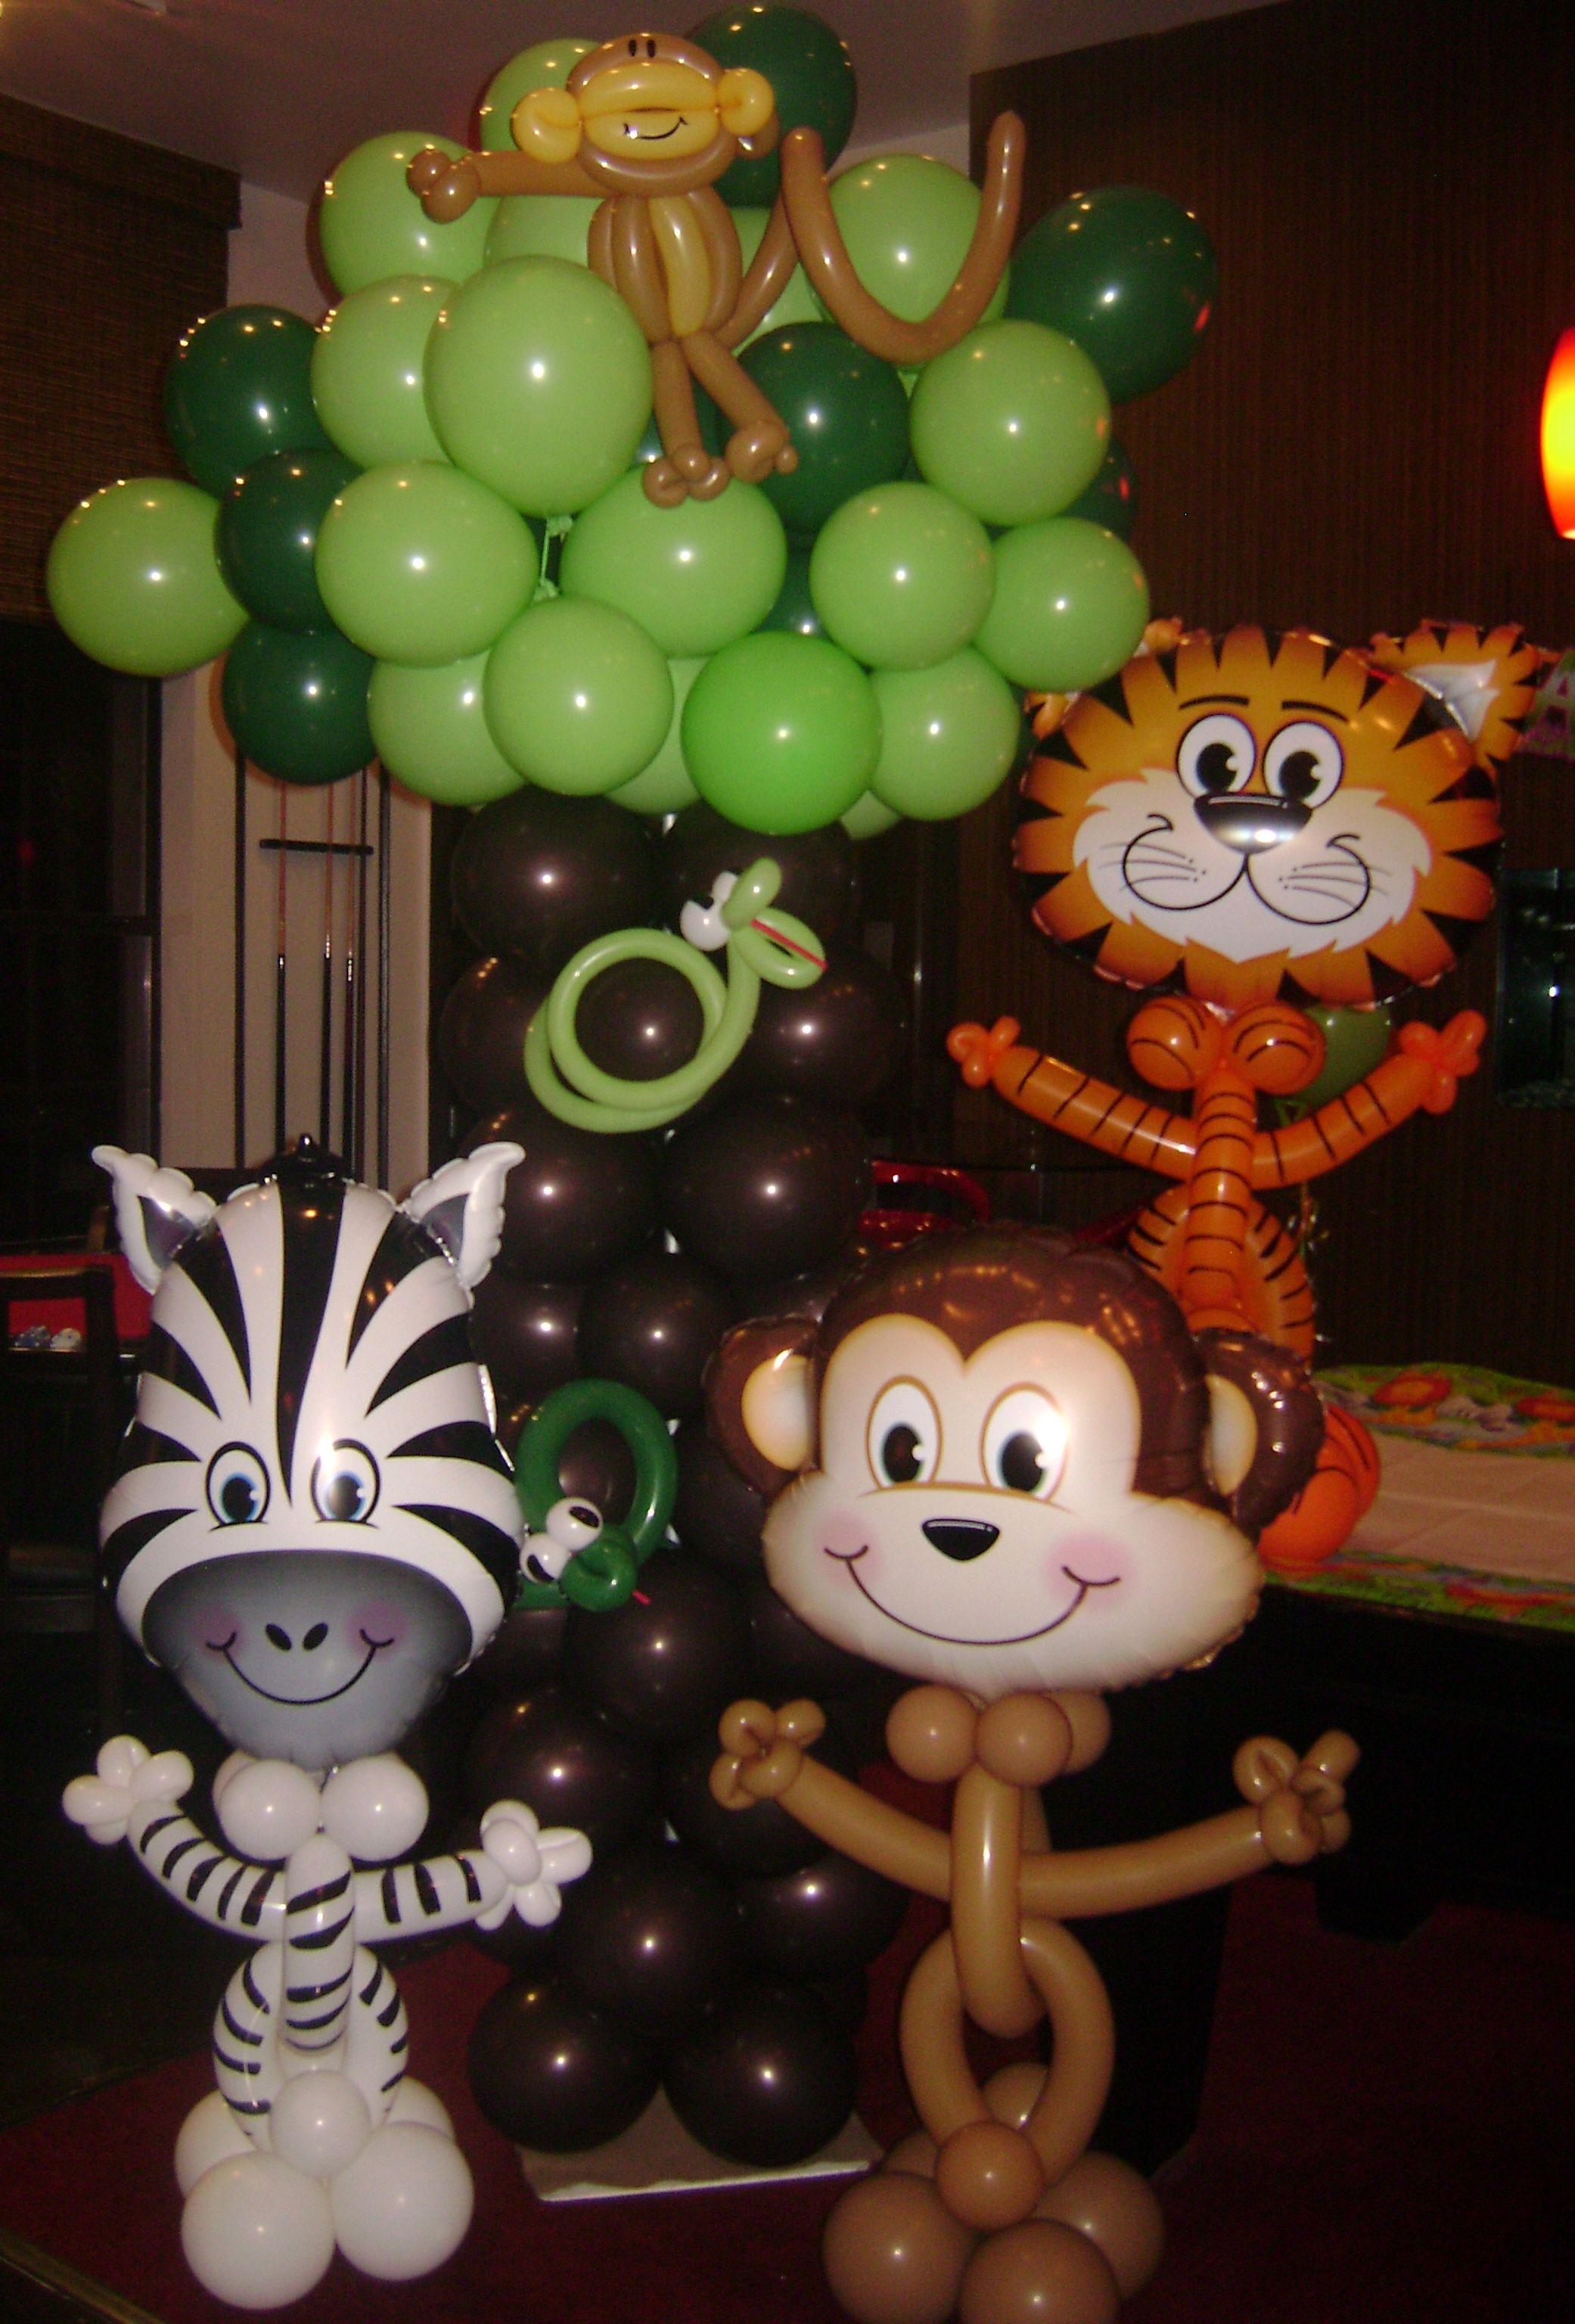 Crazy balloon animals - Crazy Balloon Animals 16